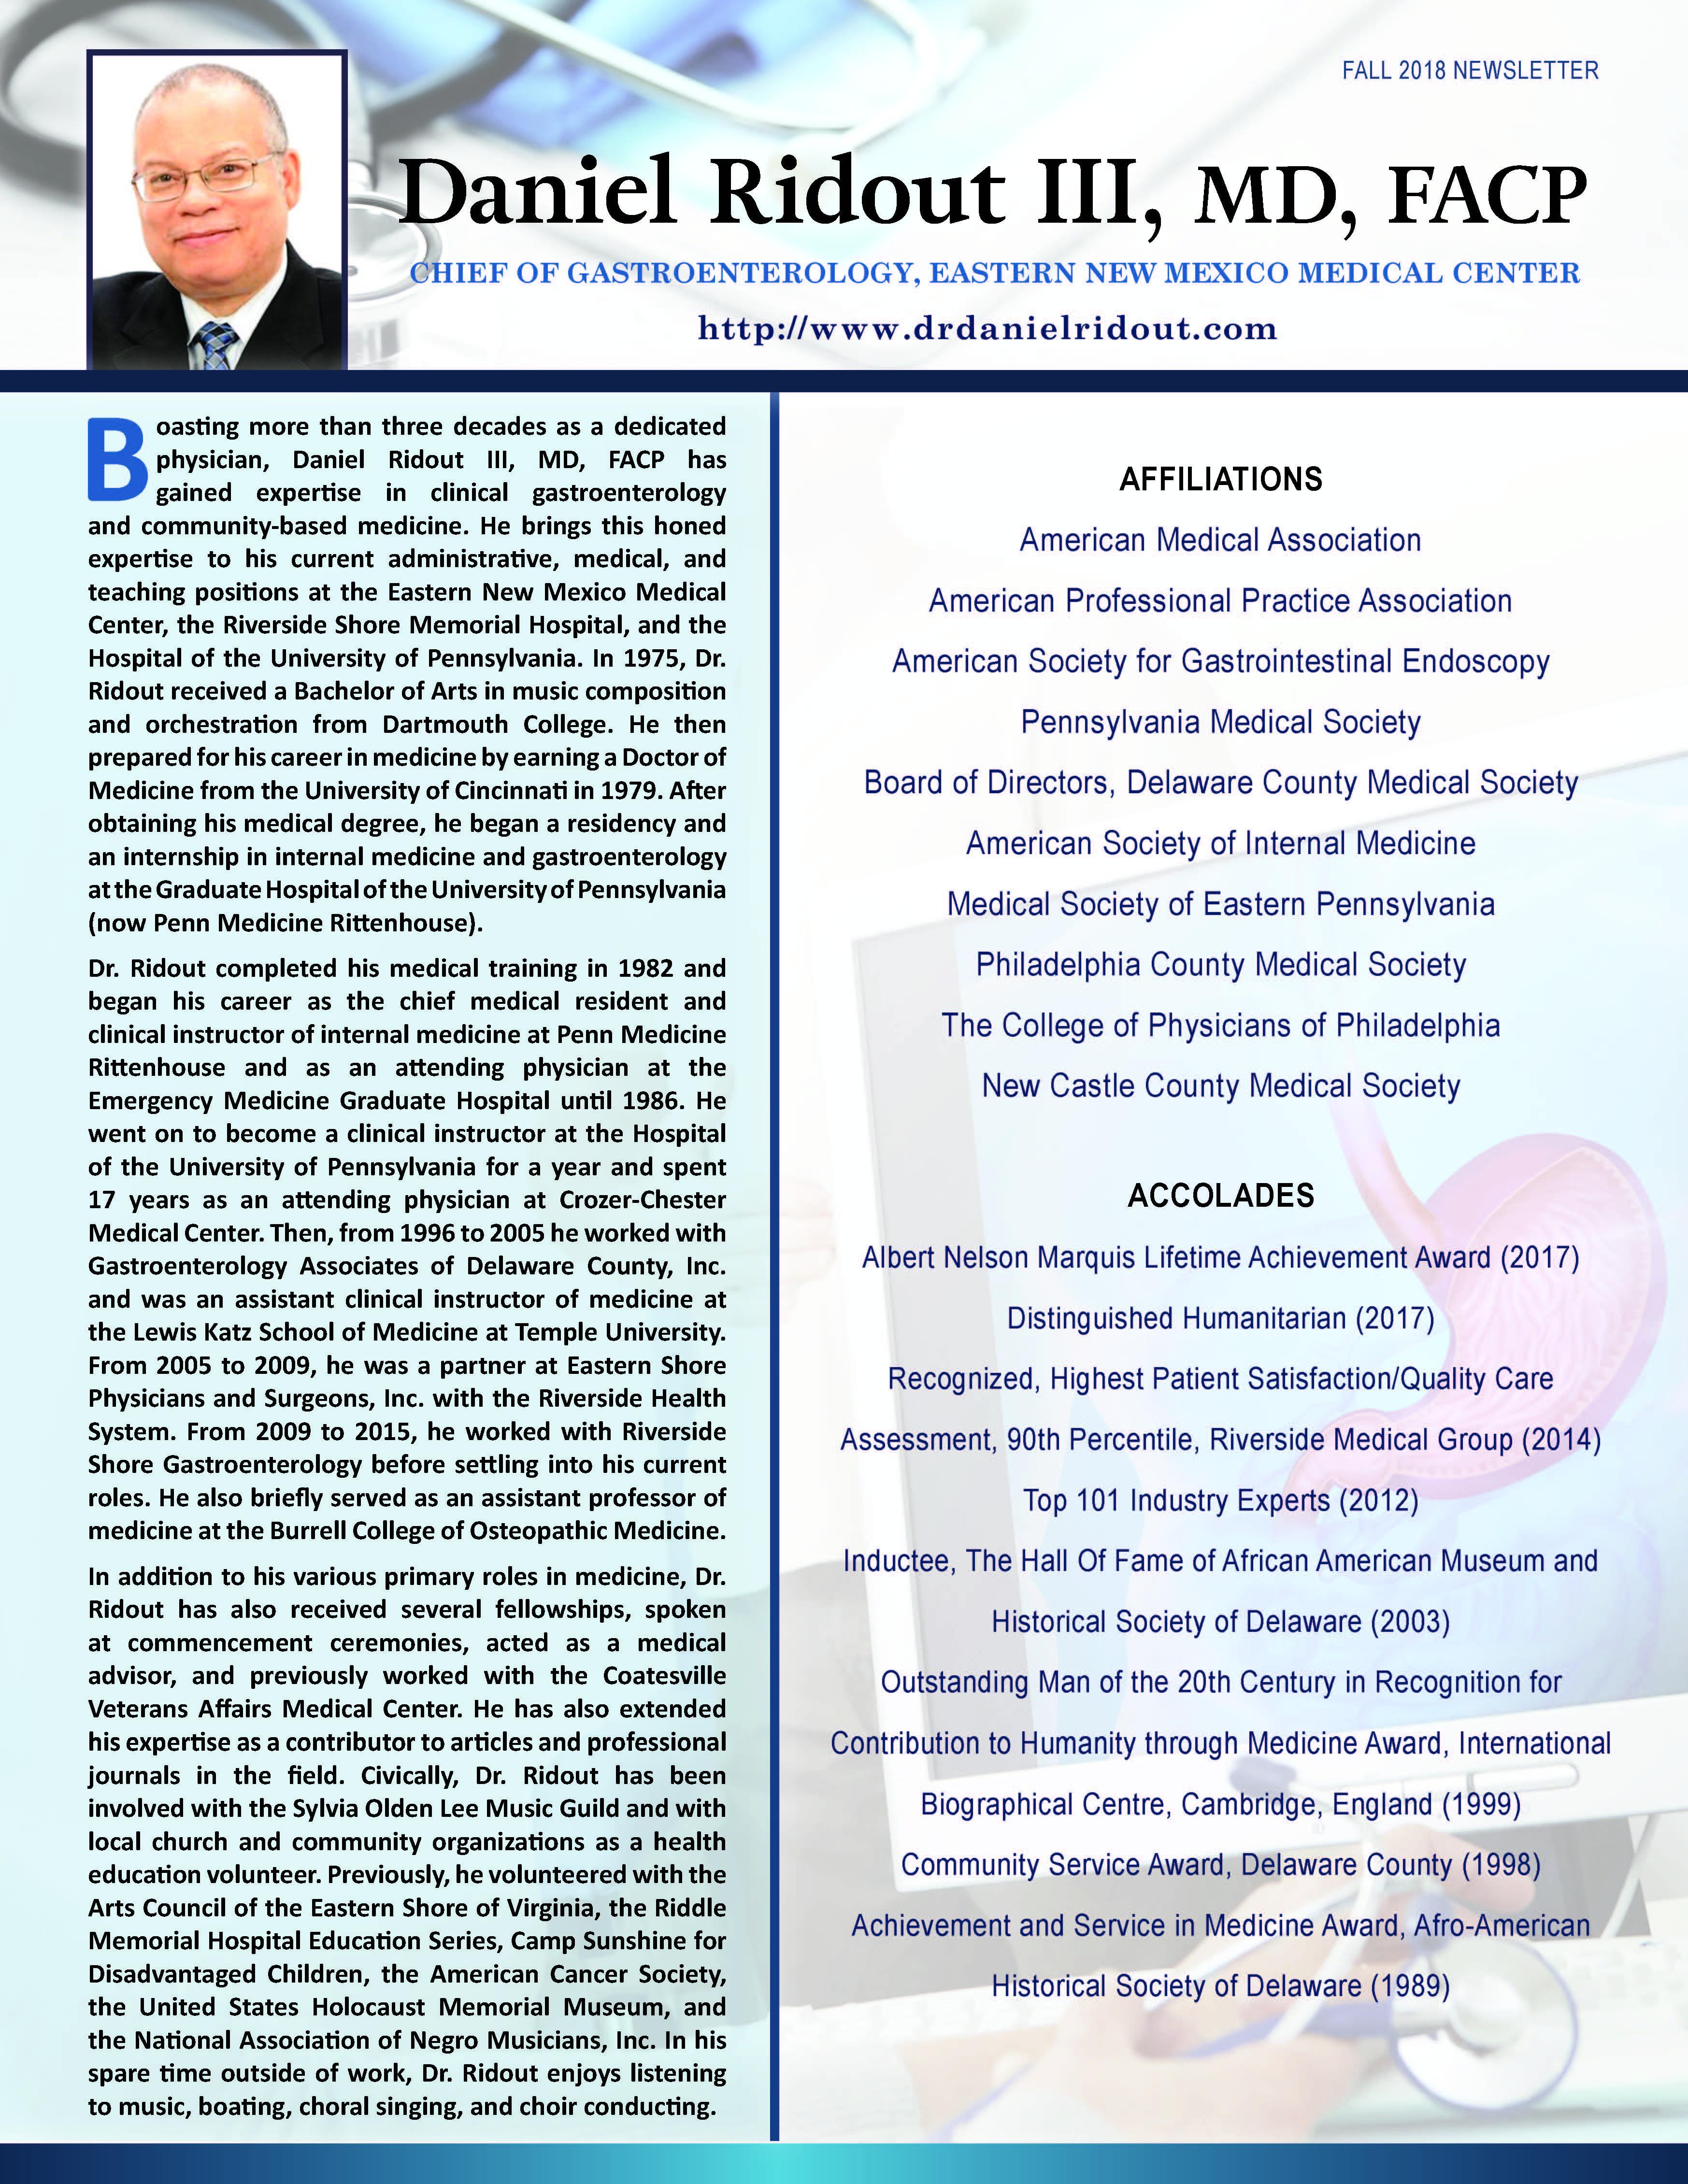 Penn Medicine Rittenhouse – Who's Who Newsletters